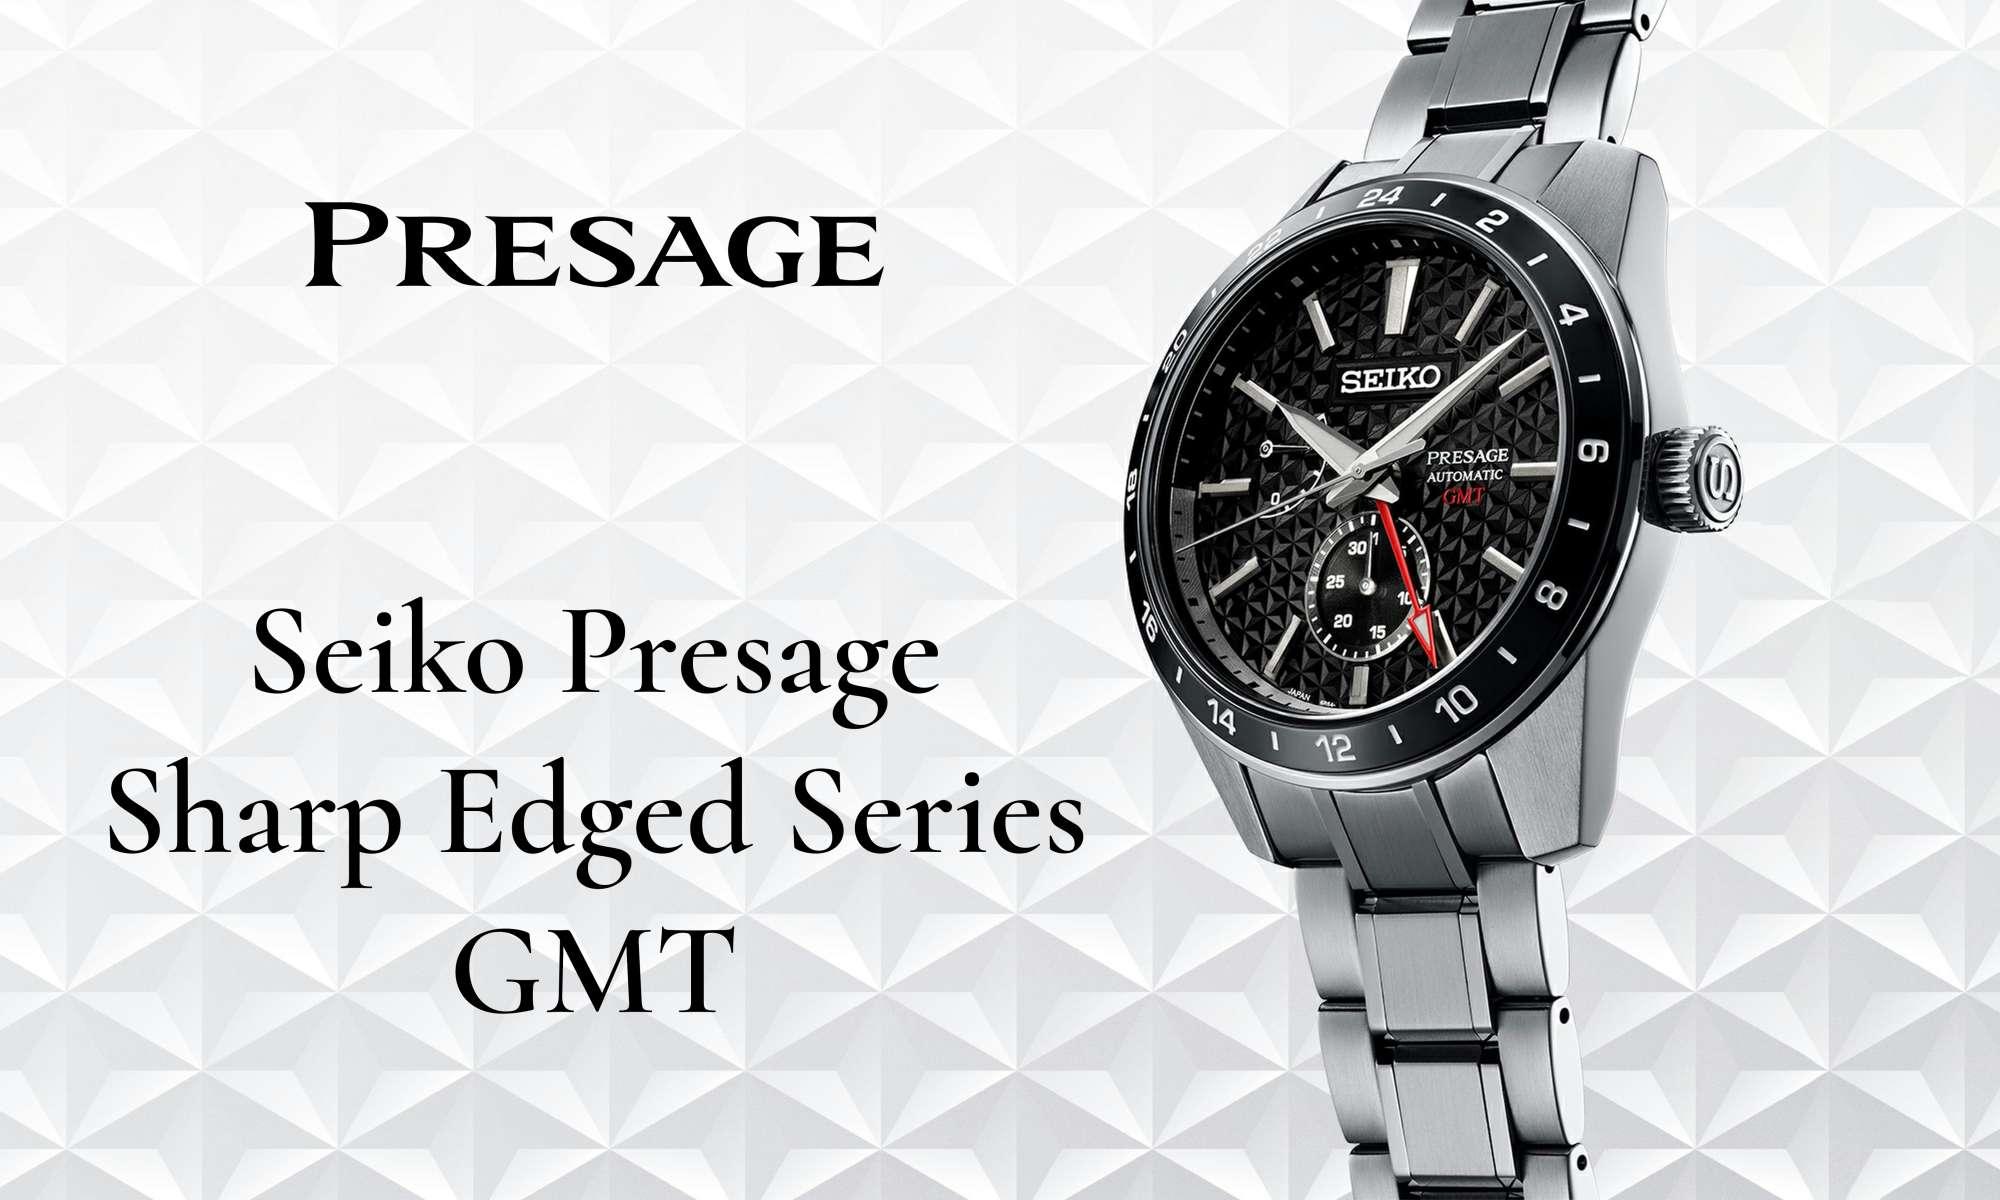 Seiko Presage Sharp Edged Series GMT